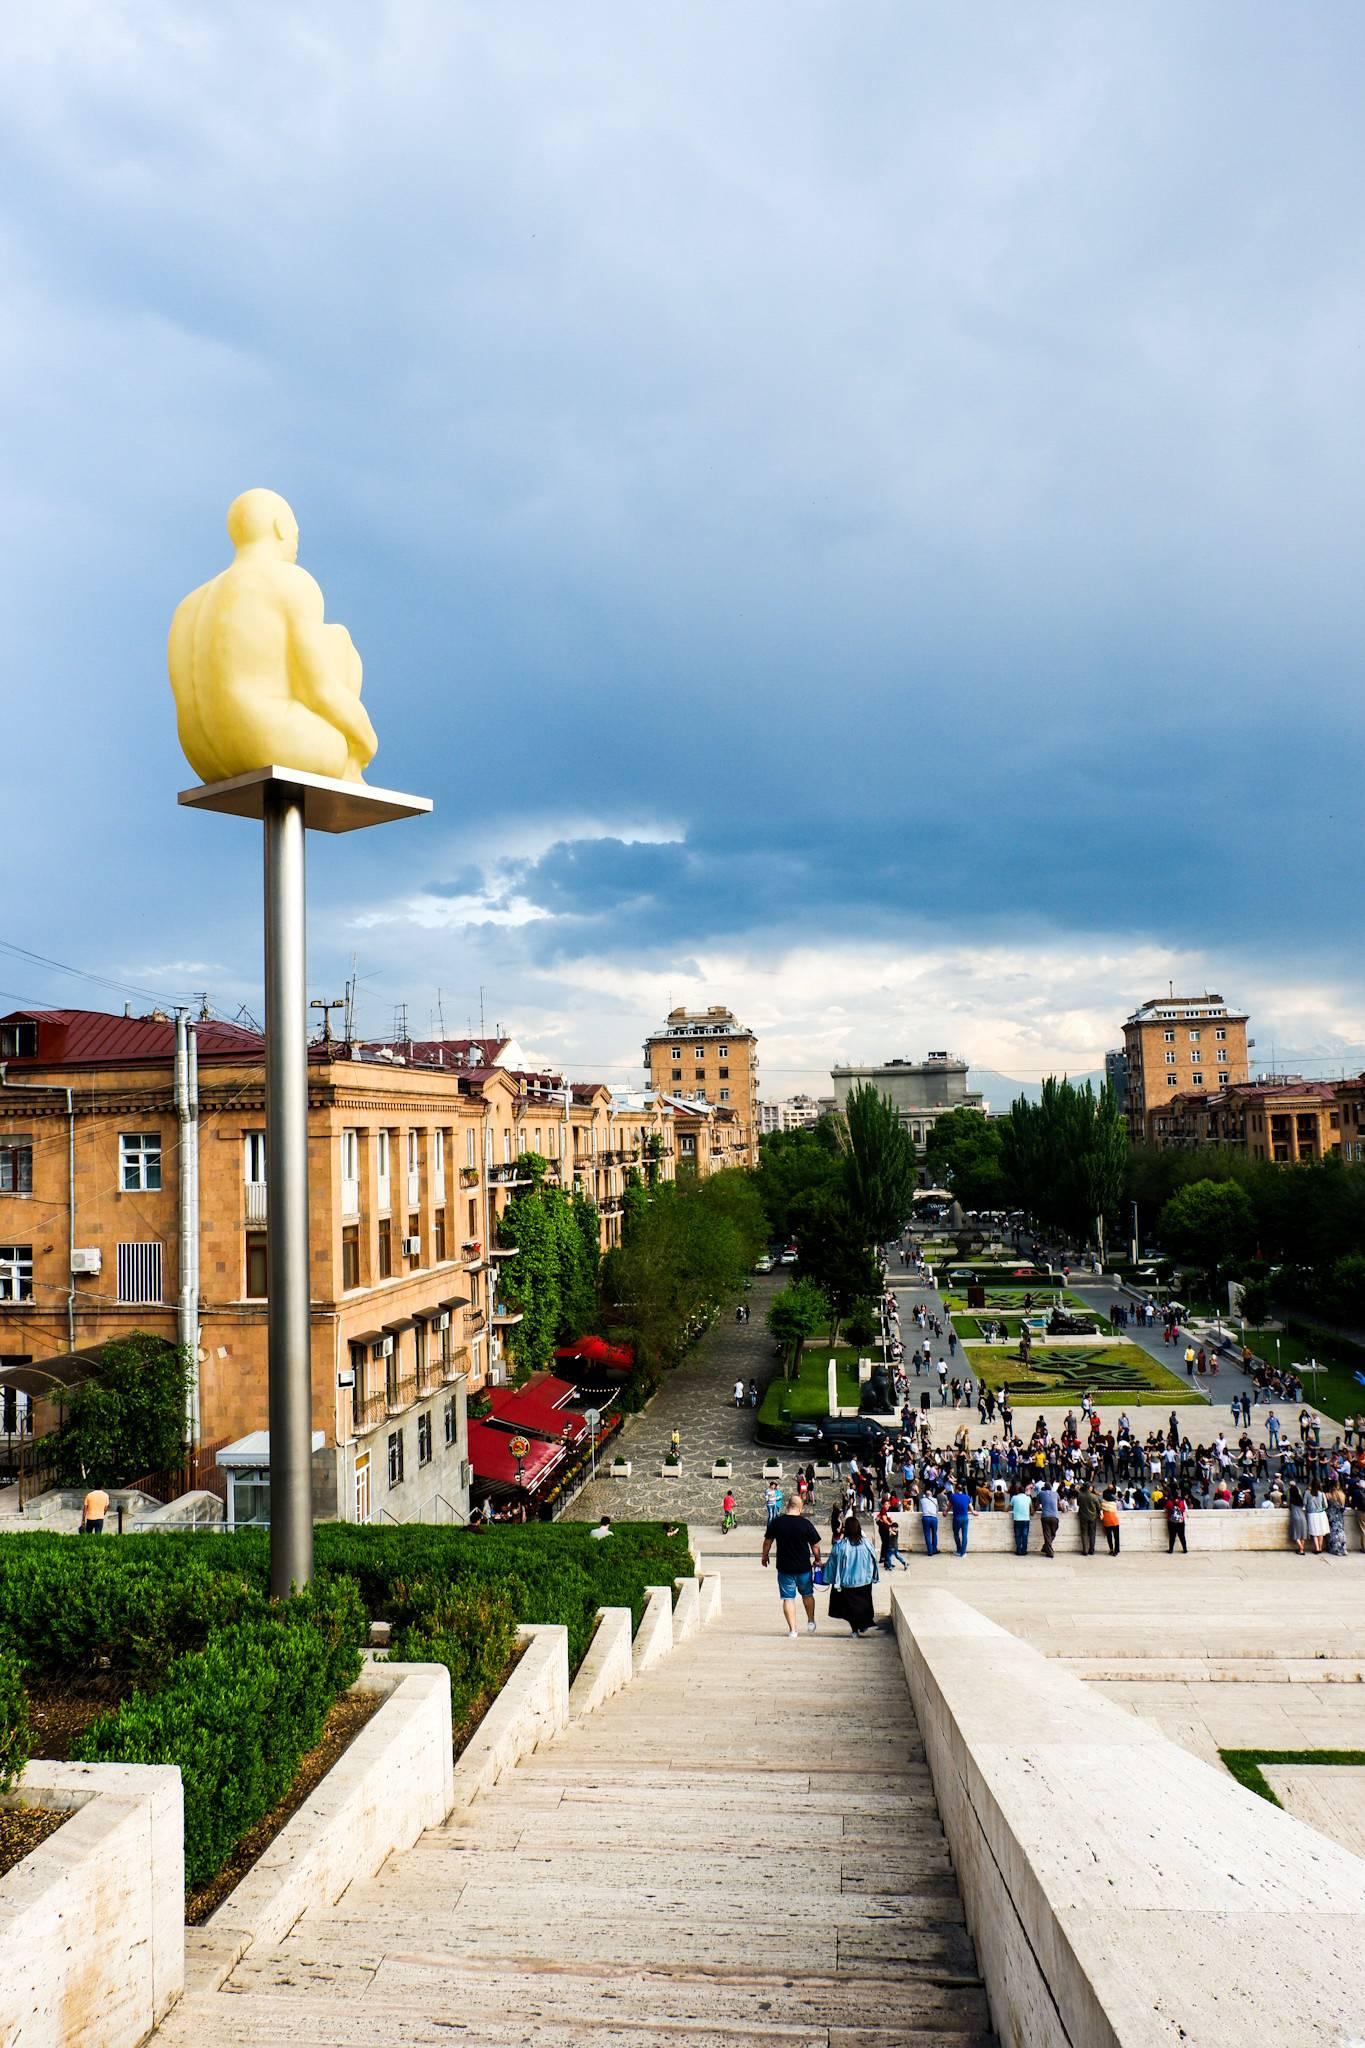 Cascade stairs and art in Yerevan Armenia